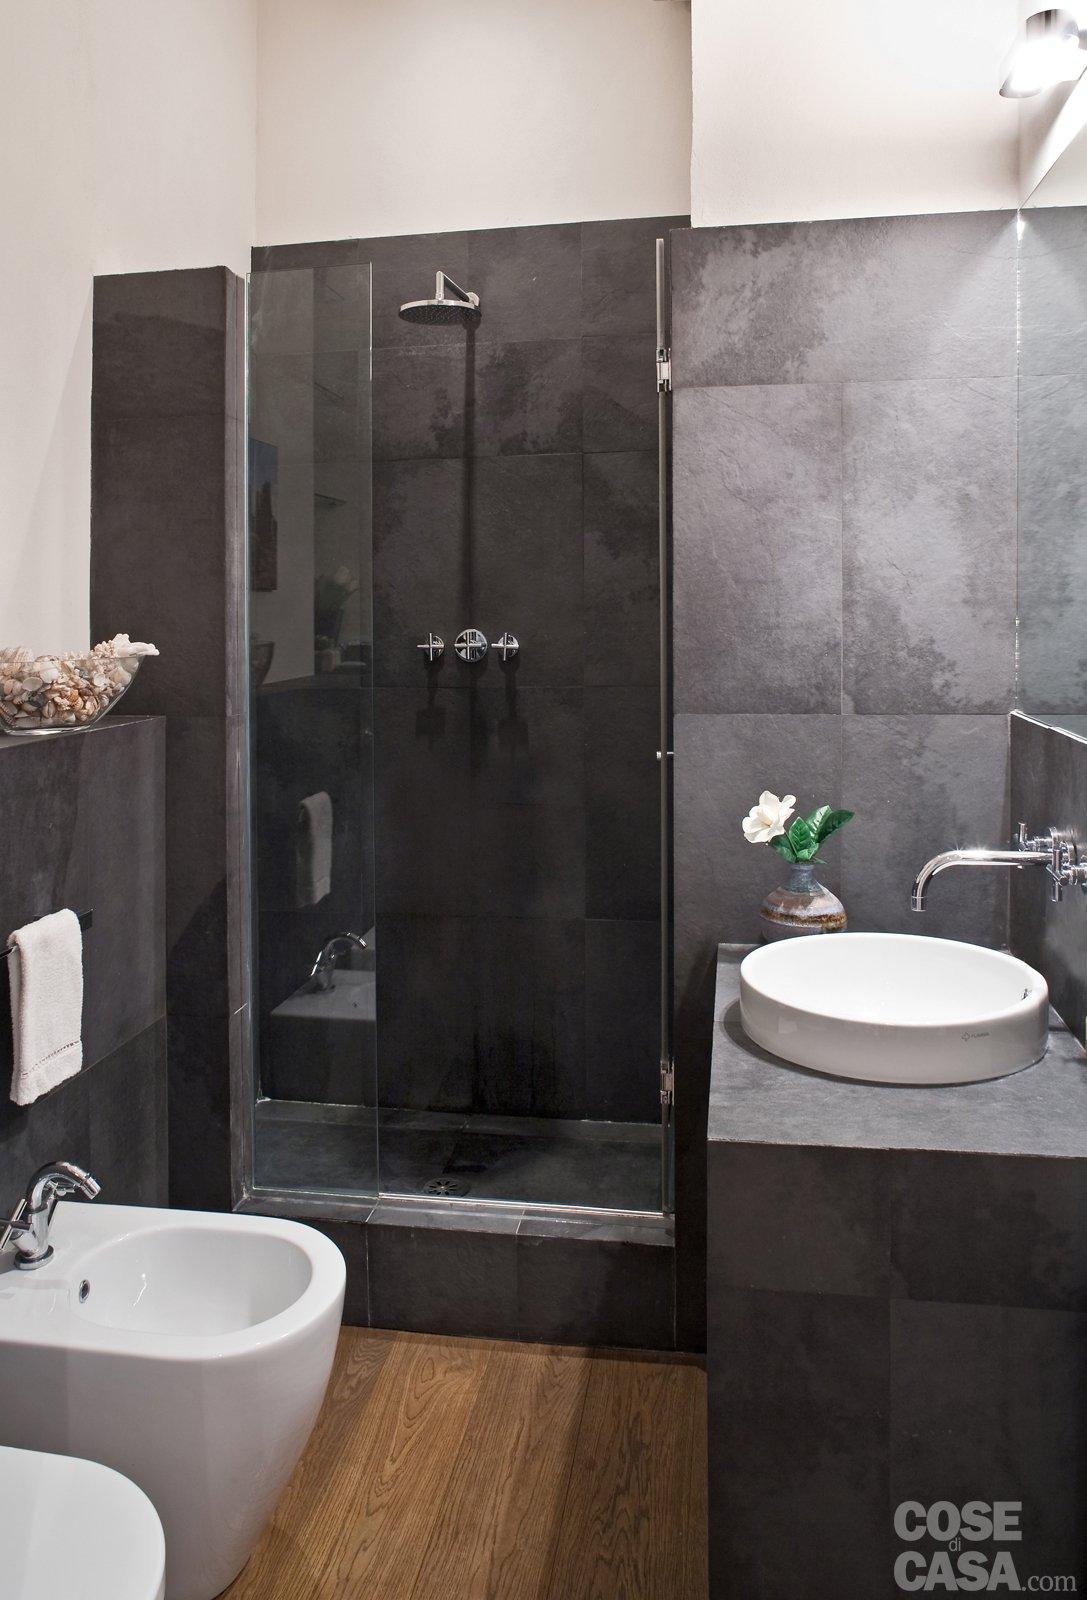 Una casa di 80 mq superfunzionali cose di casa - Bagno moderno foto ...